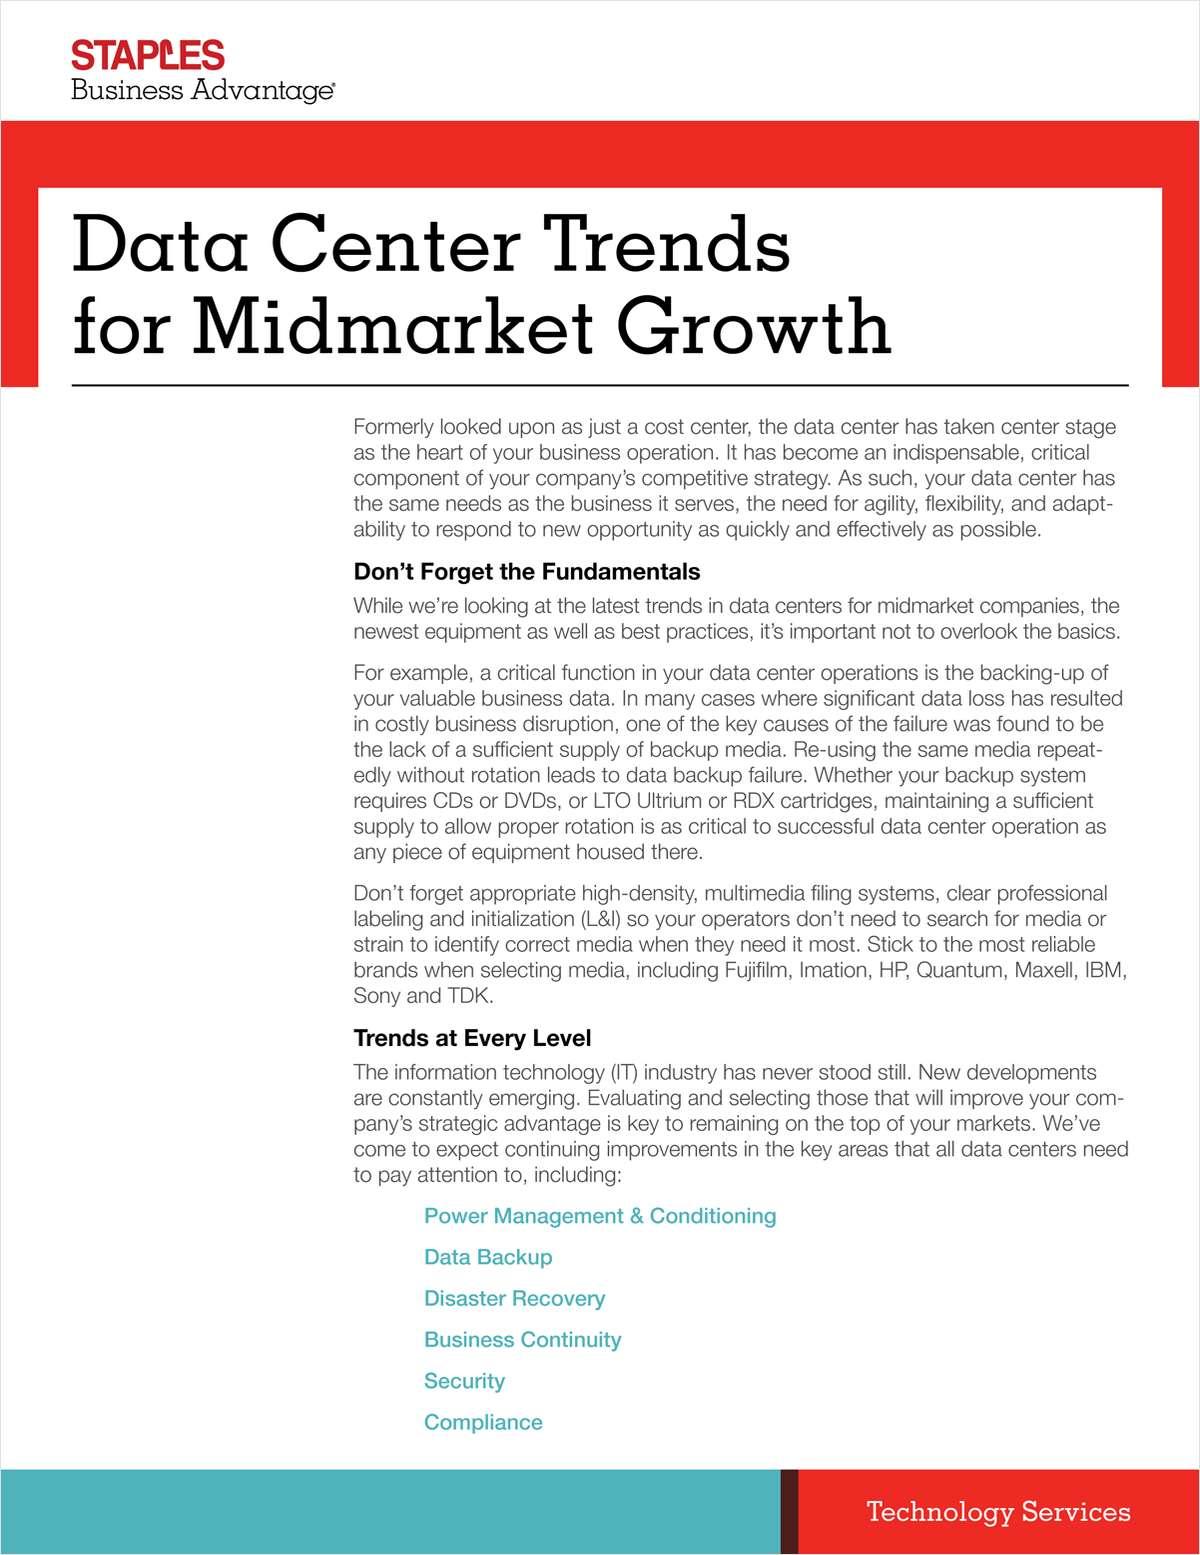 Data Center Trends for Midmarket Growth